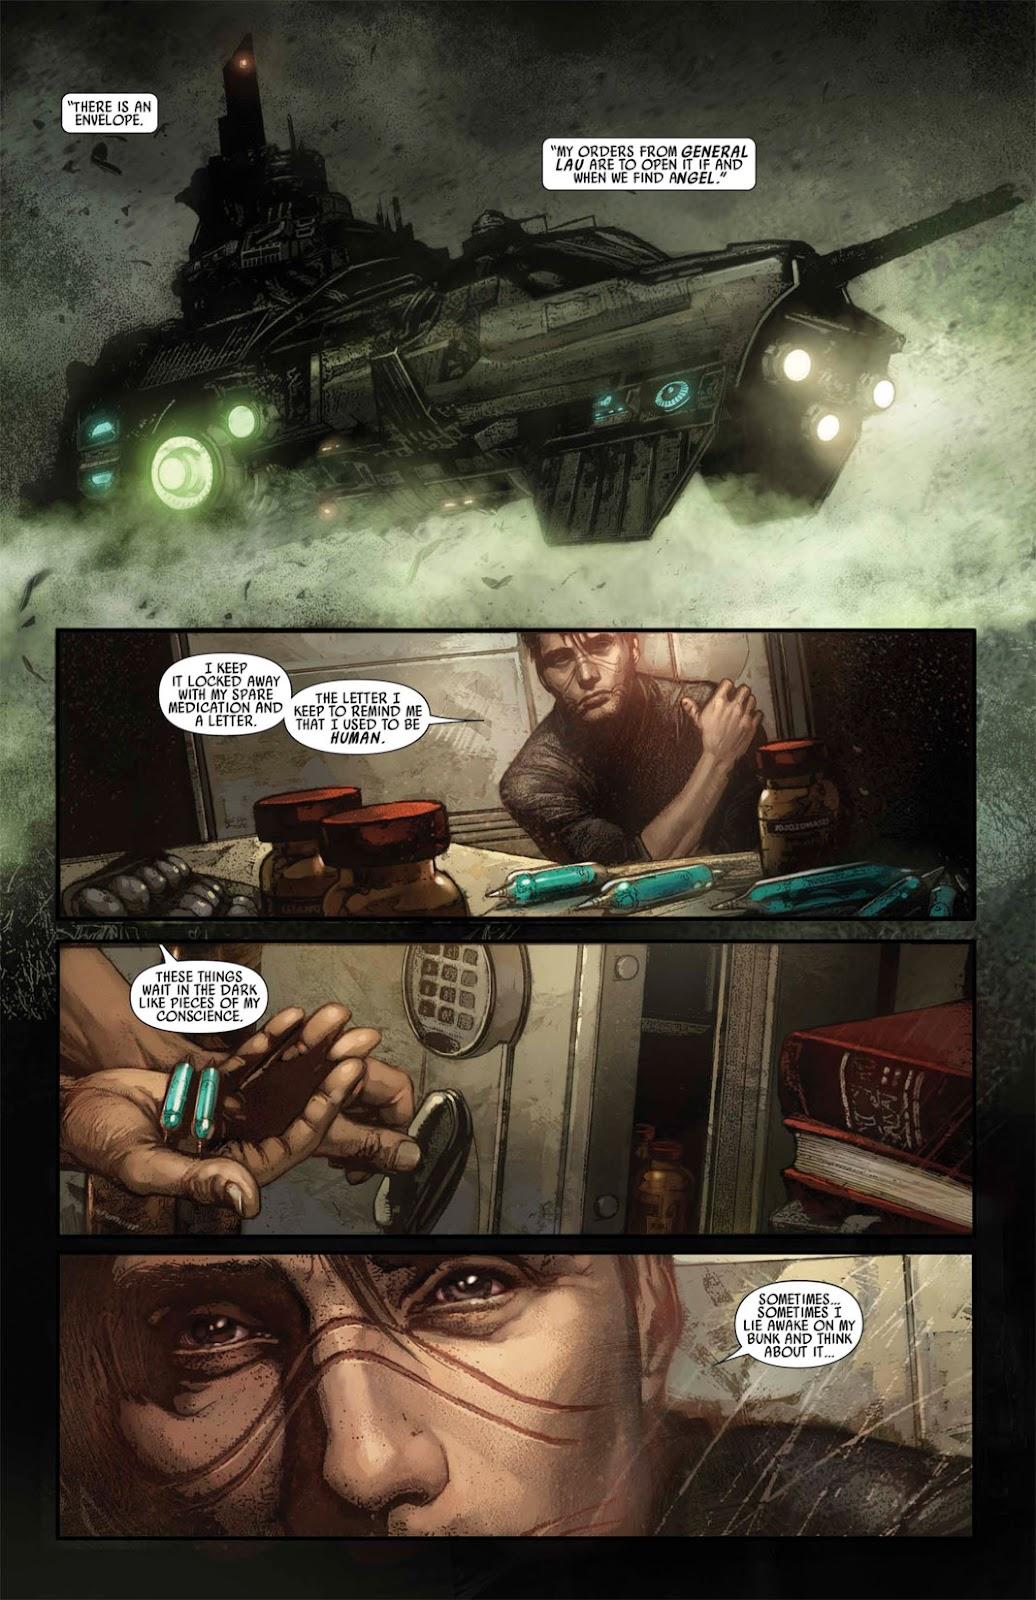 Read online After Dark comic -  Issue #2 - 3